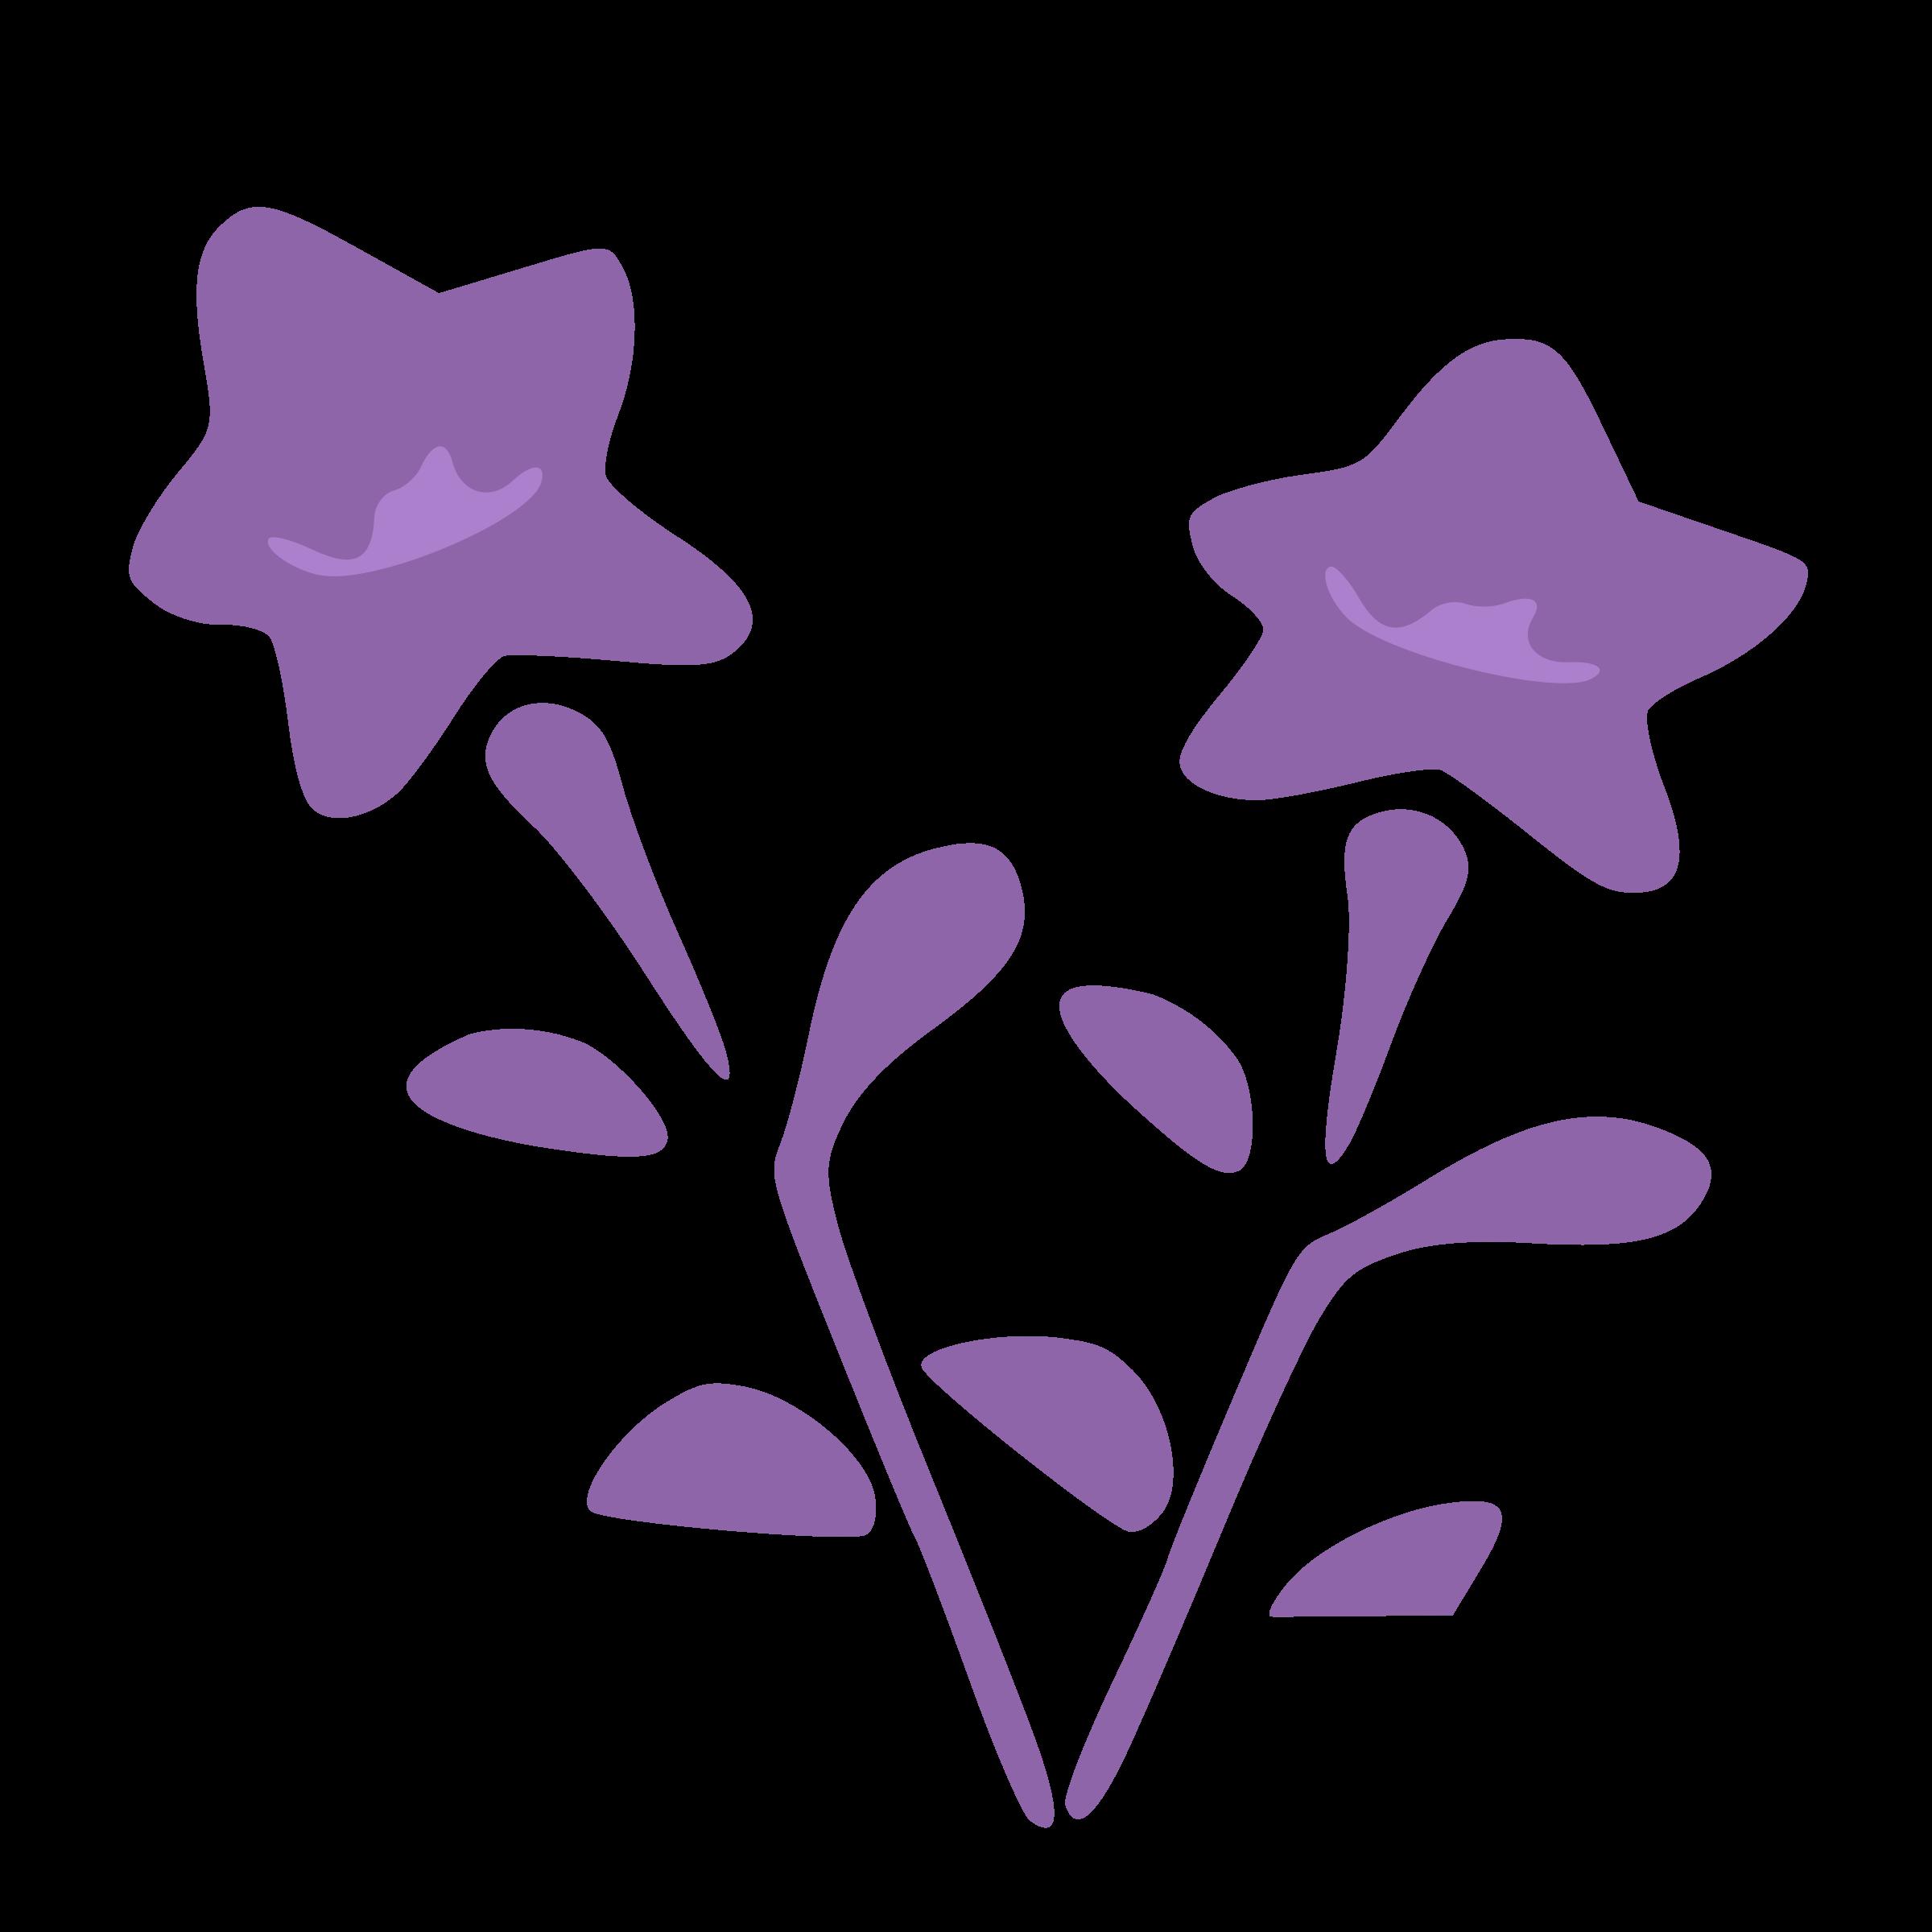 Flowers clipart root. Flower design pinterest vector